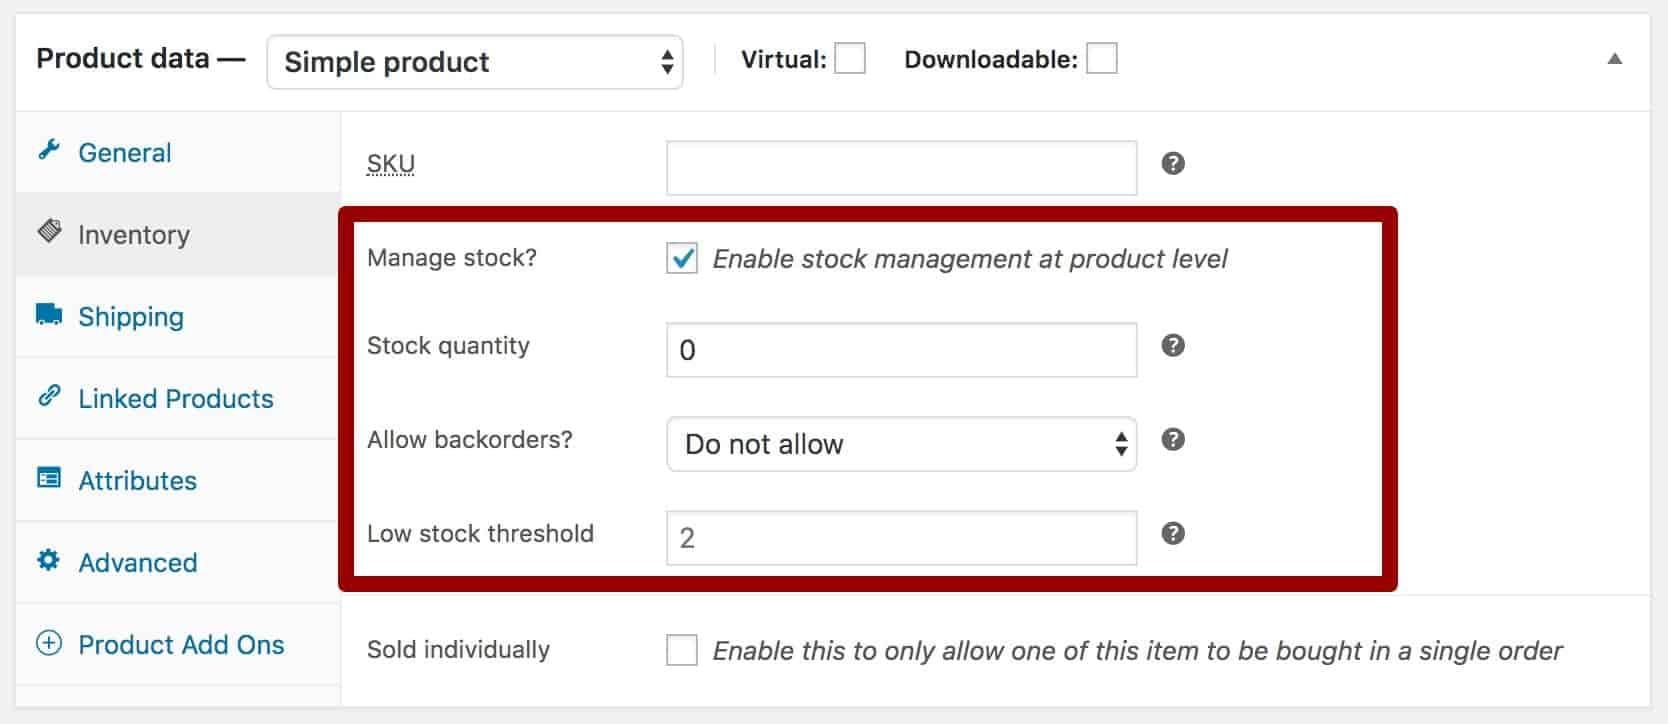 WooCommerce product manage stock option selected